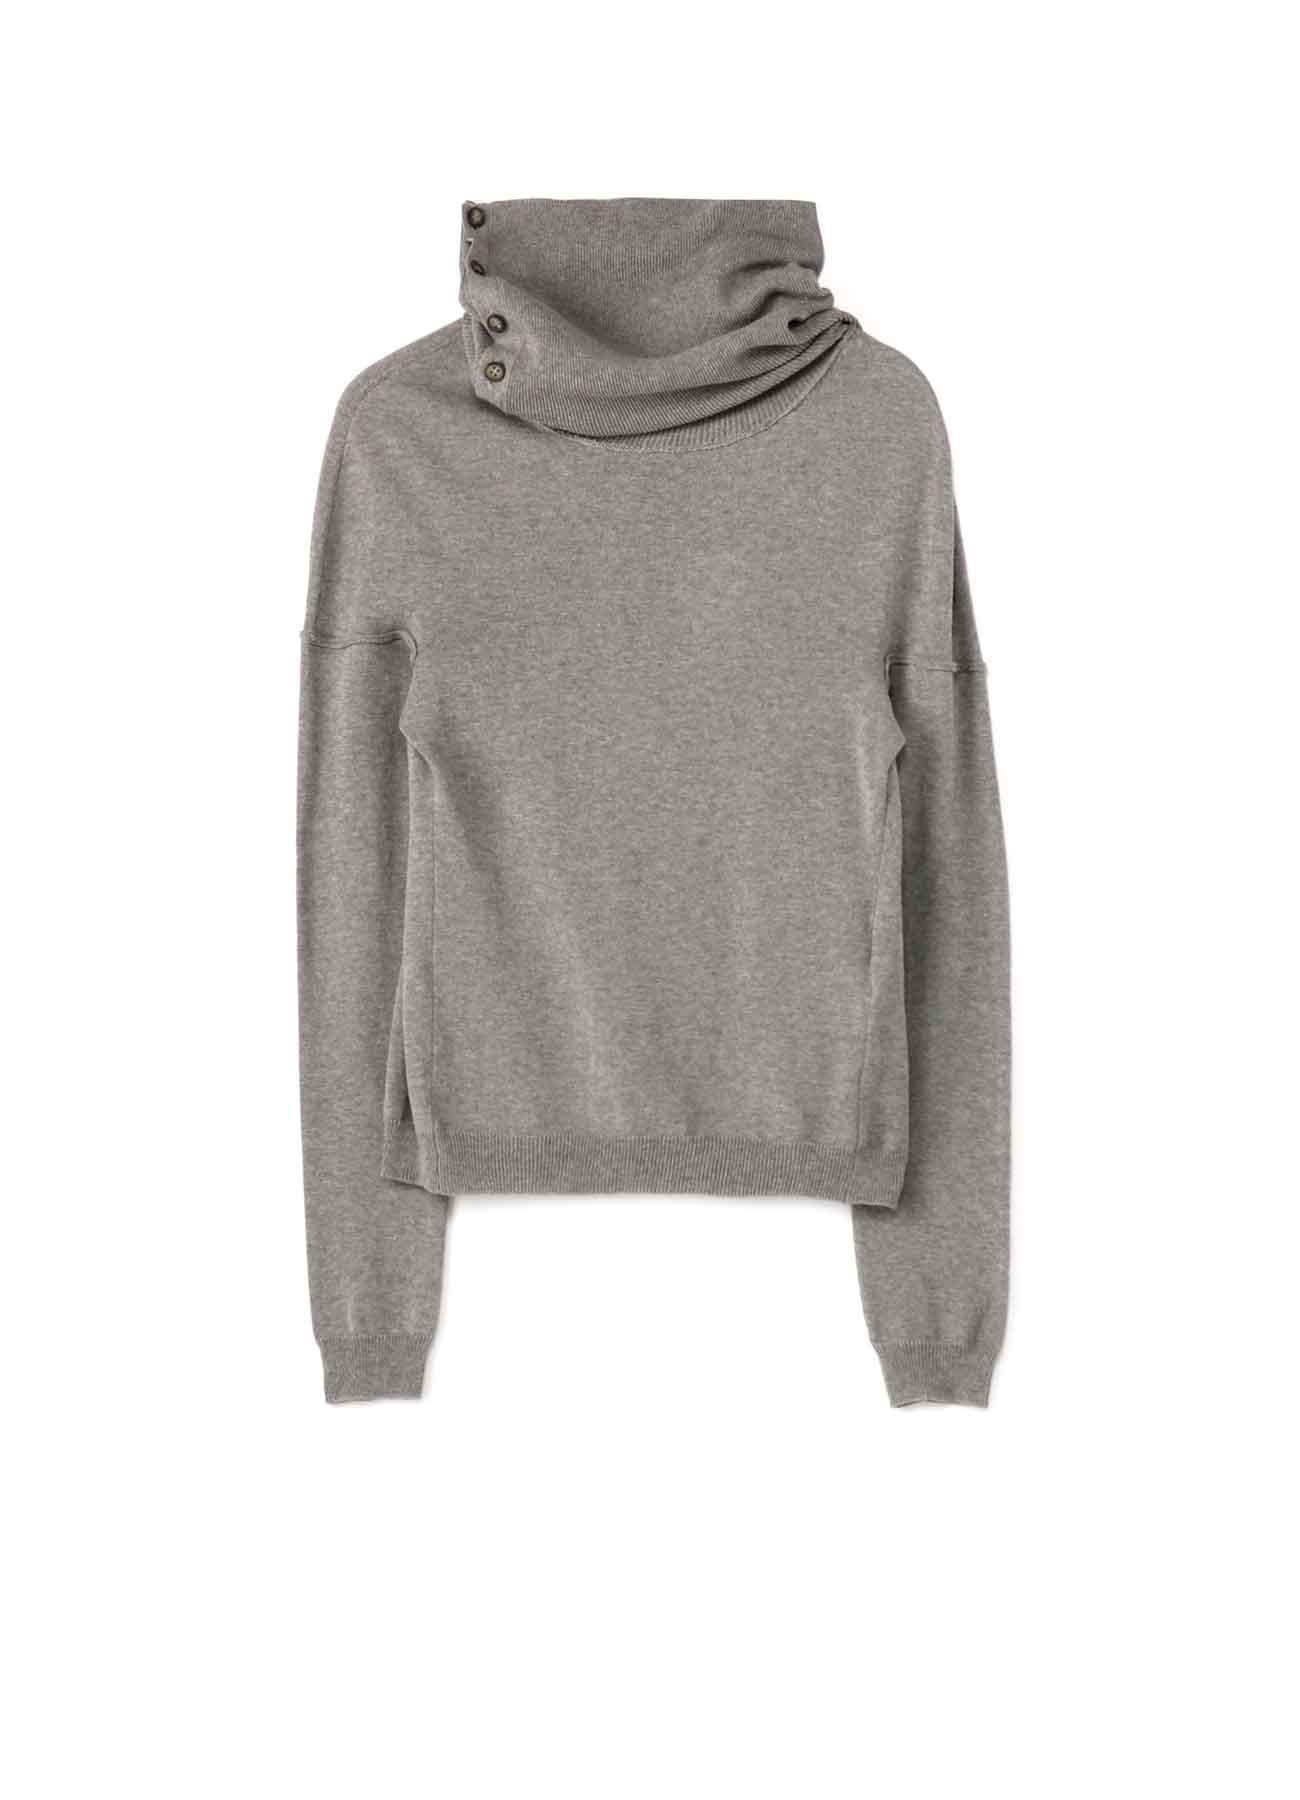 40/2 Cotton Strong twisted Plain Stitch 2Way Sweater